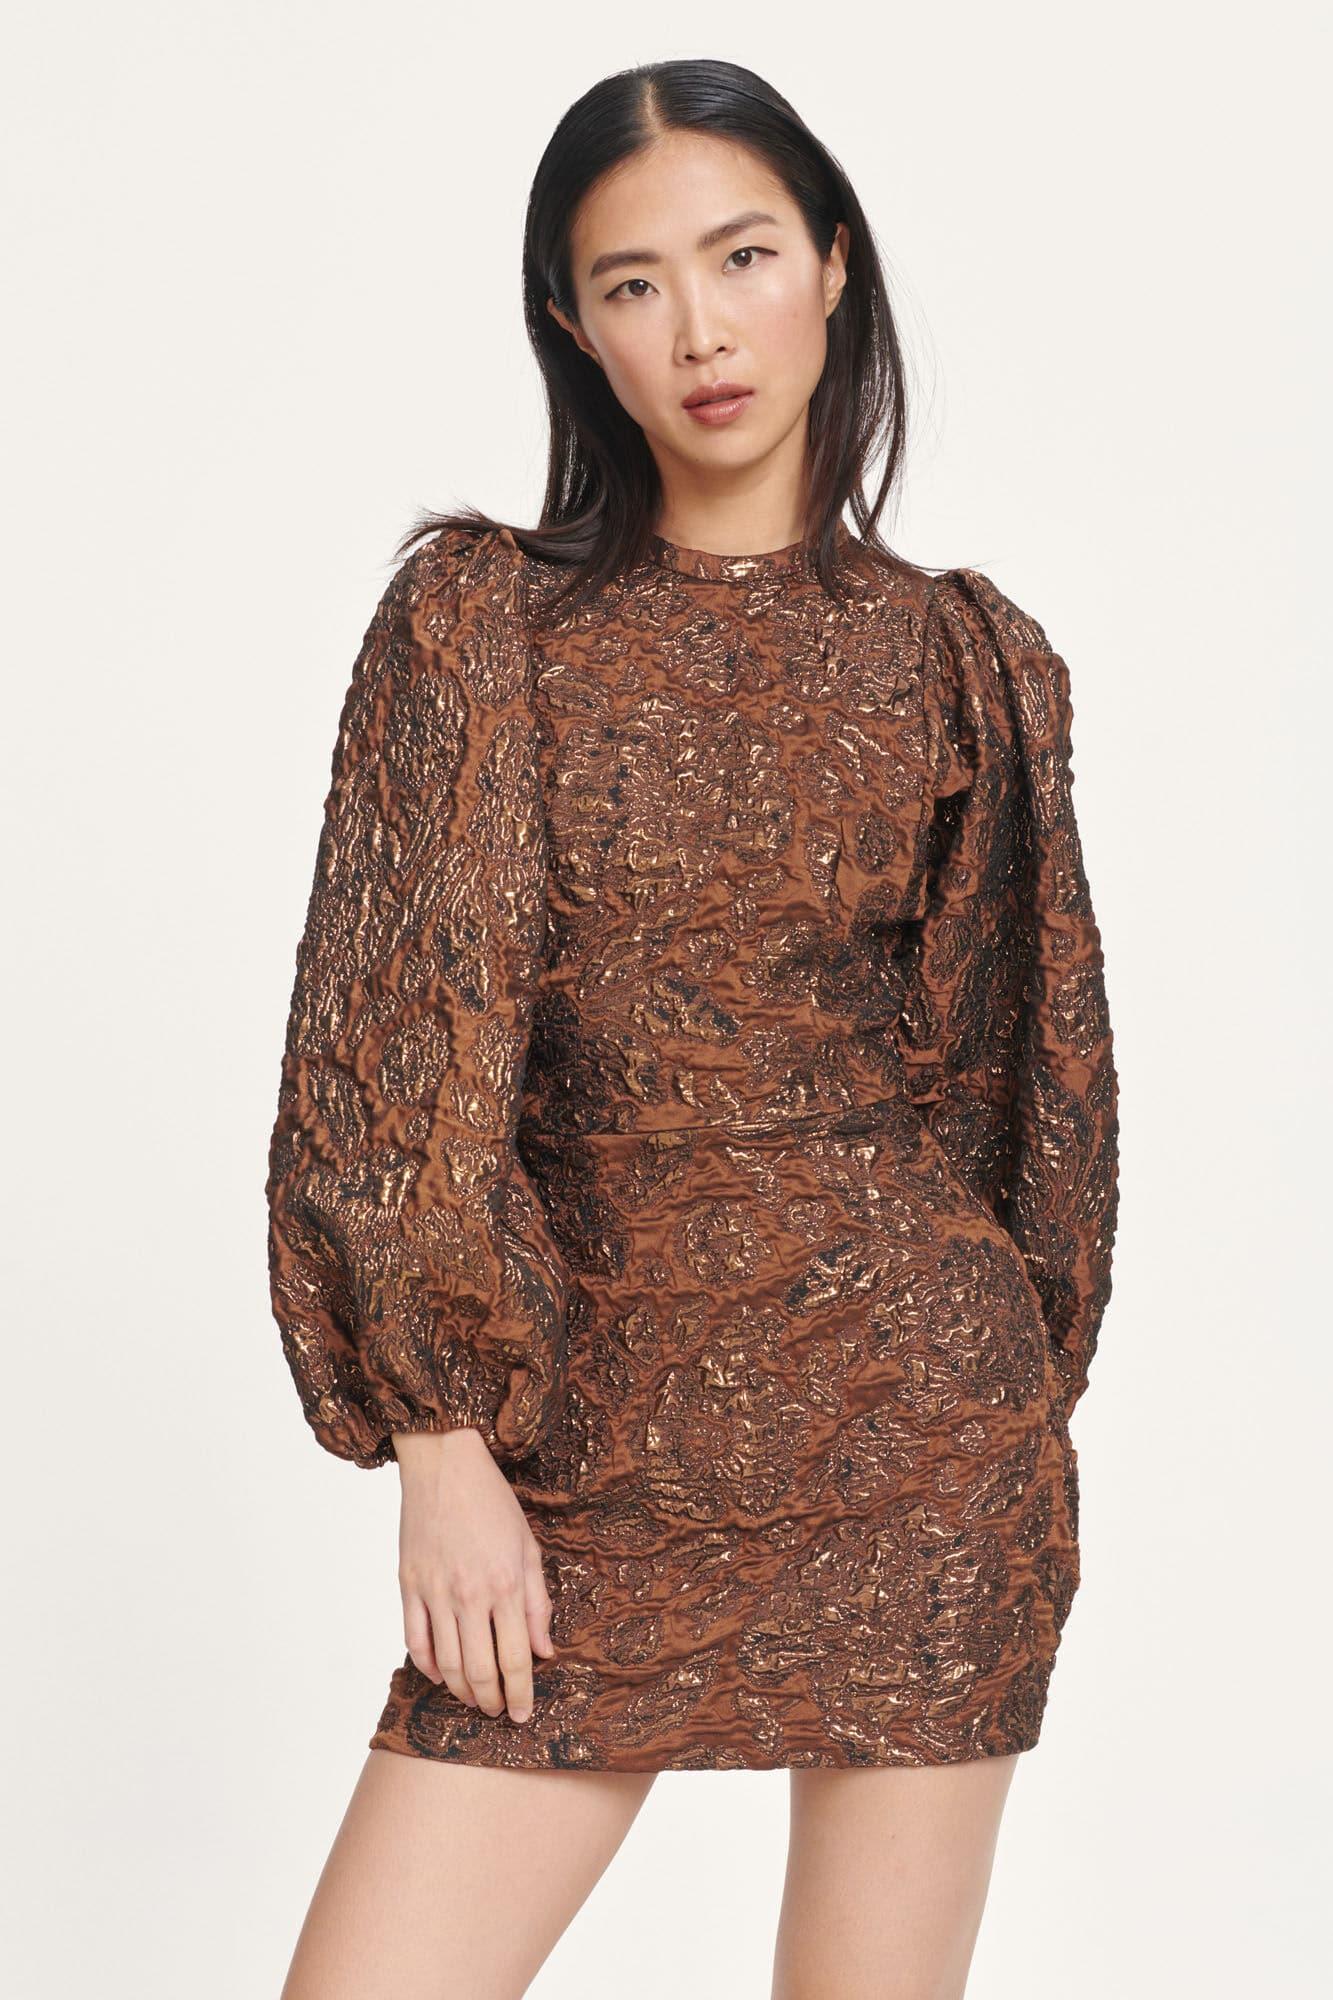 Model in brown mini dress